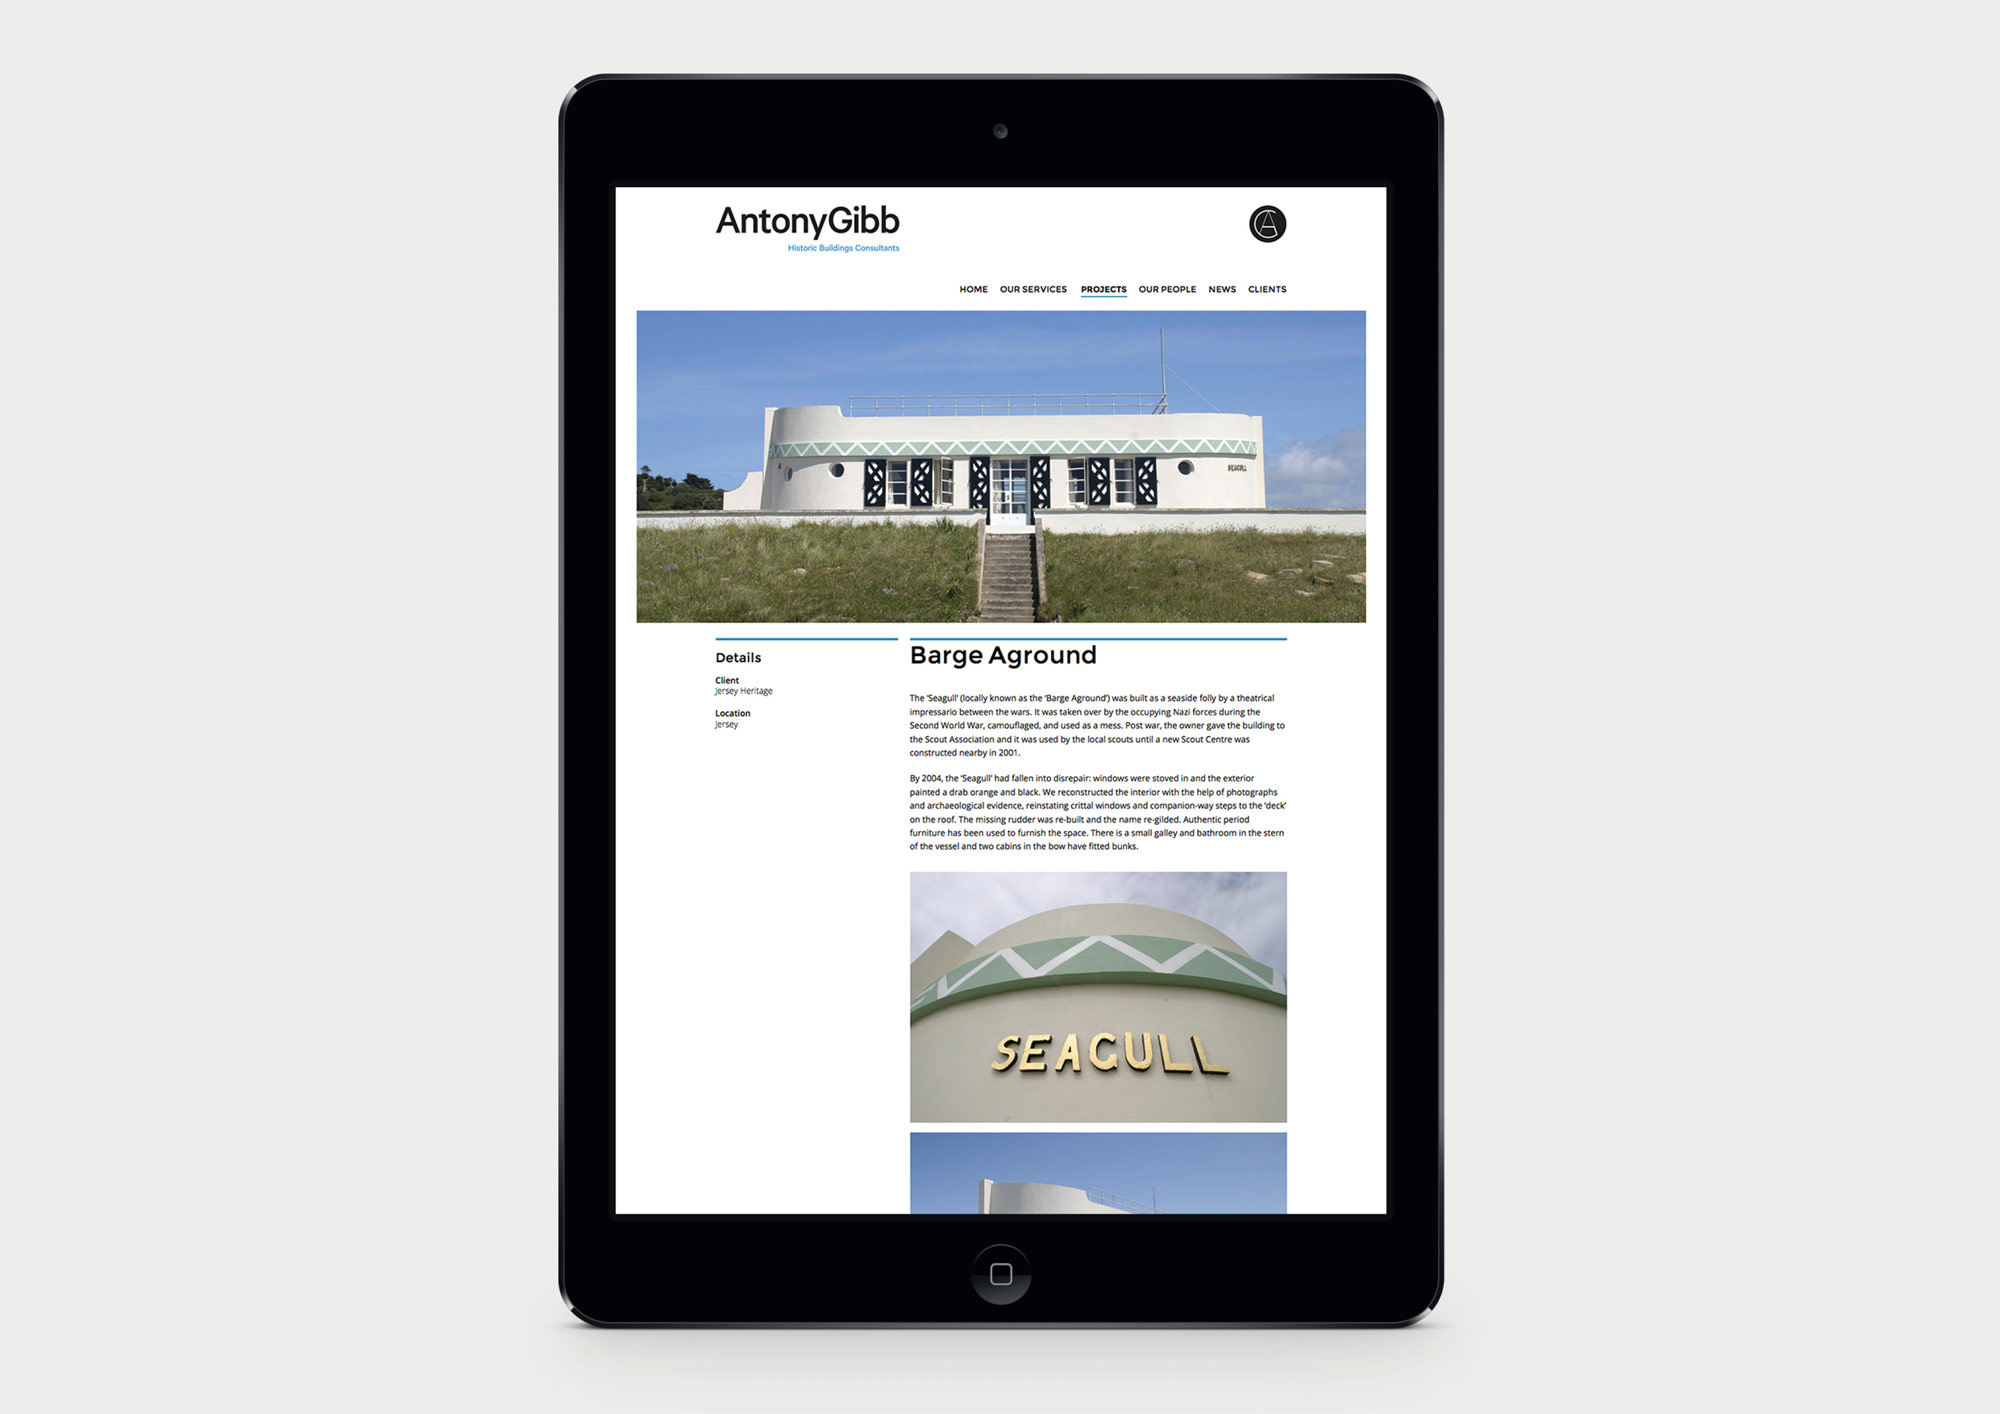 Antony Gibb website